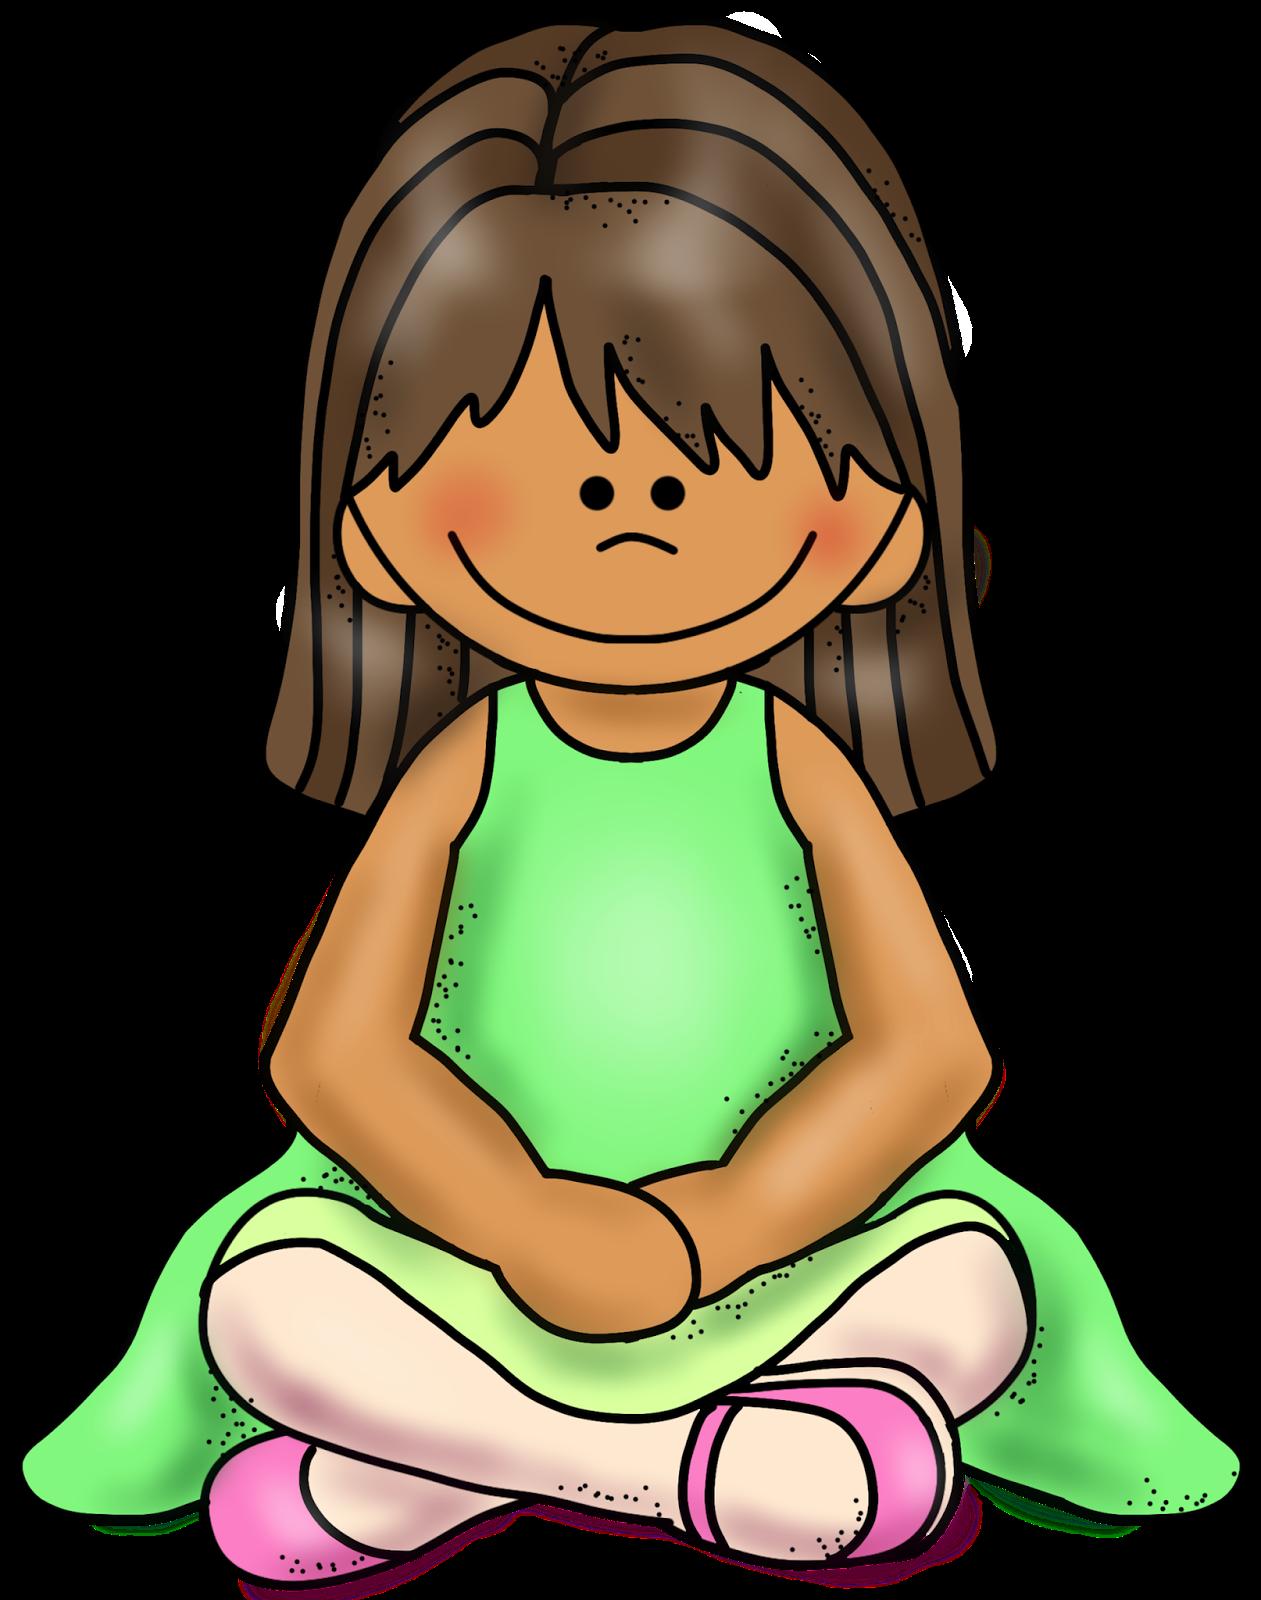 Girl sitting criss cross clip art